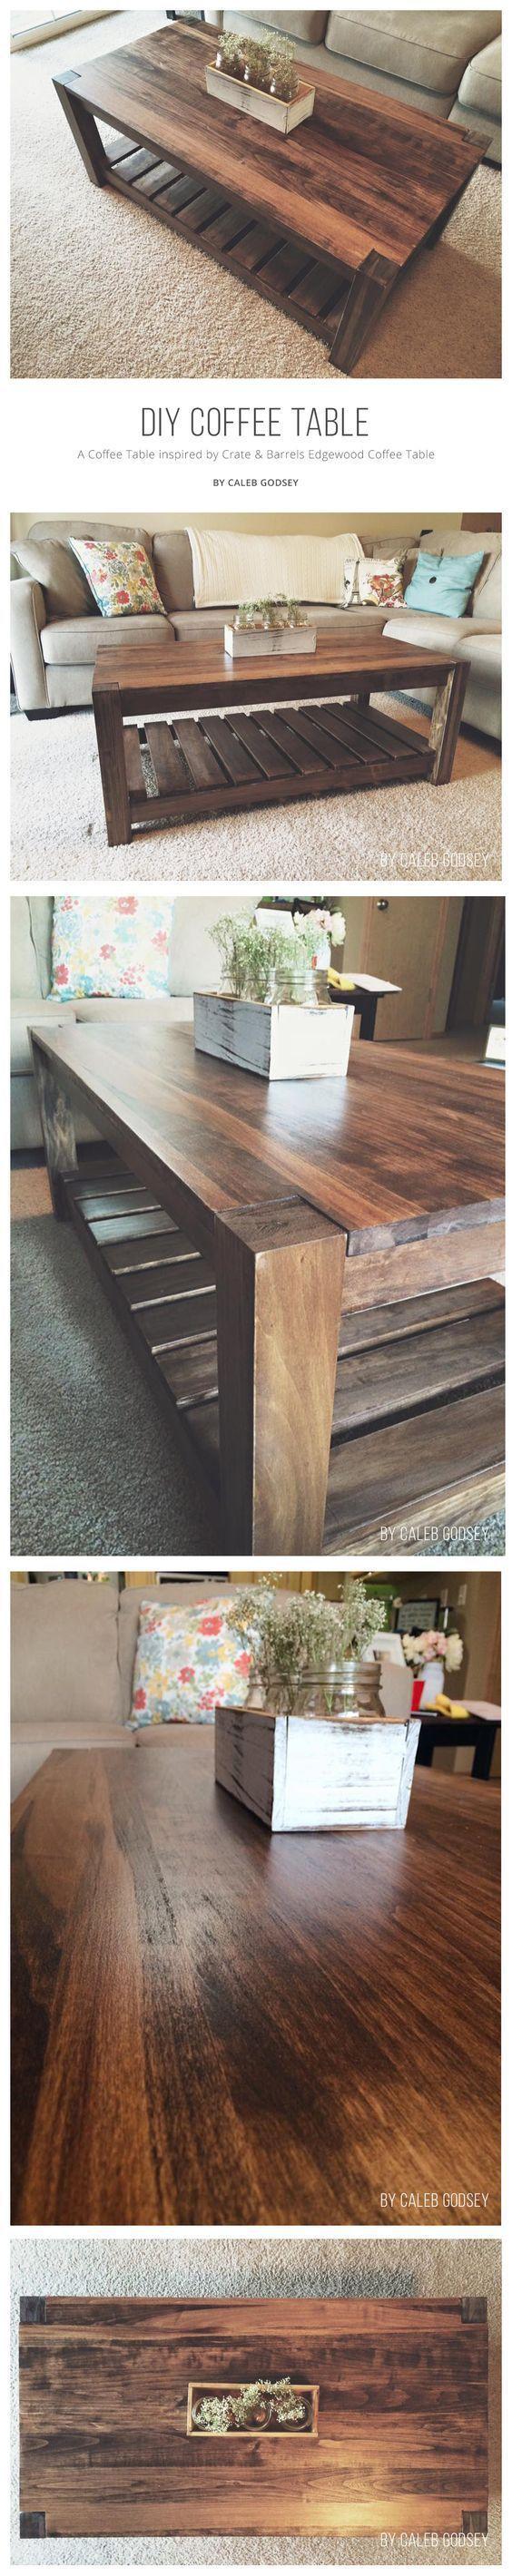 5.DIY Rustikaler Tisch